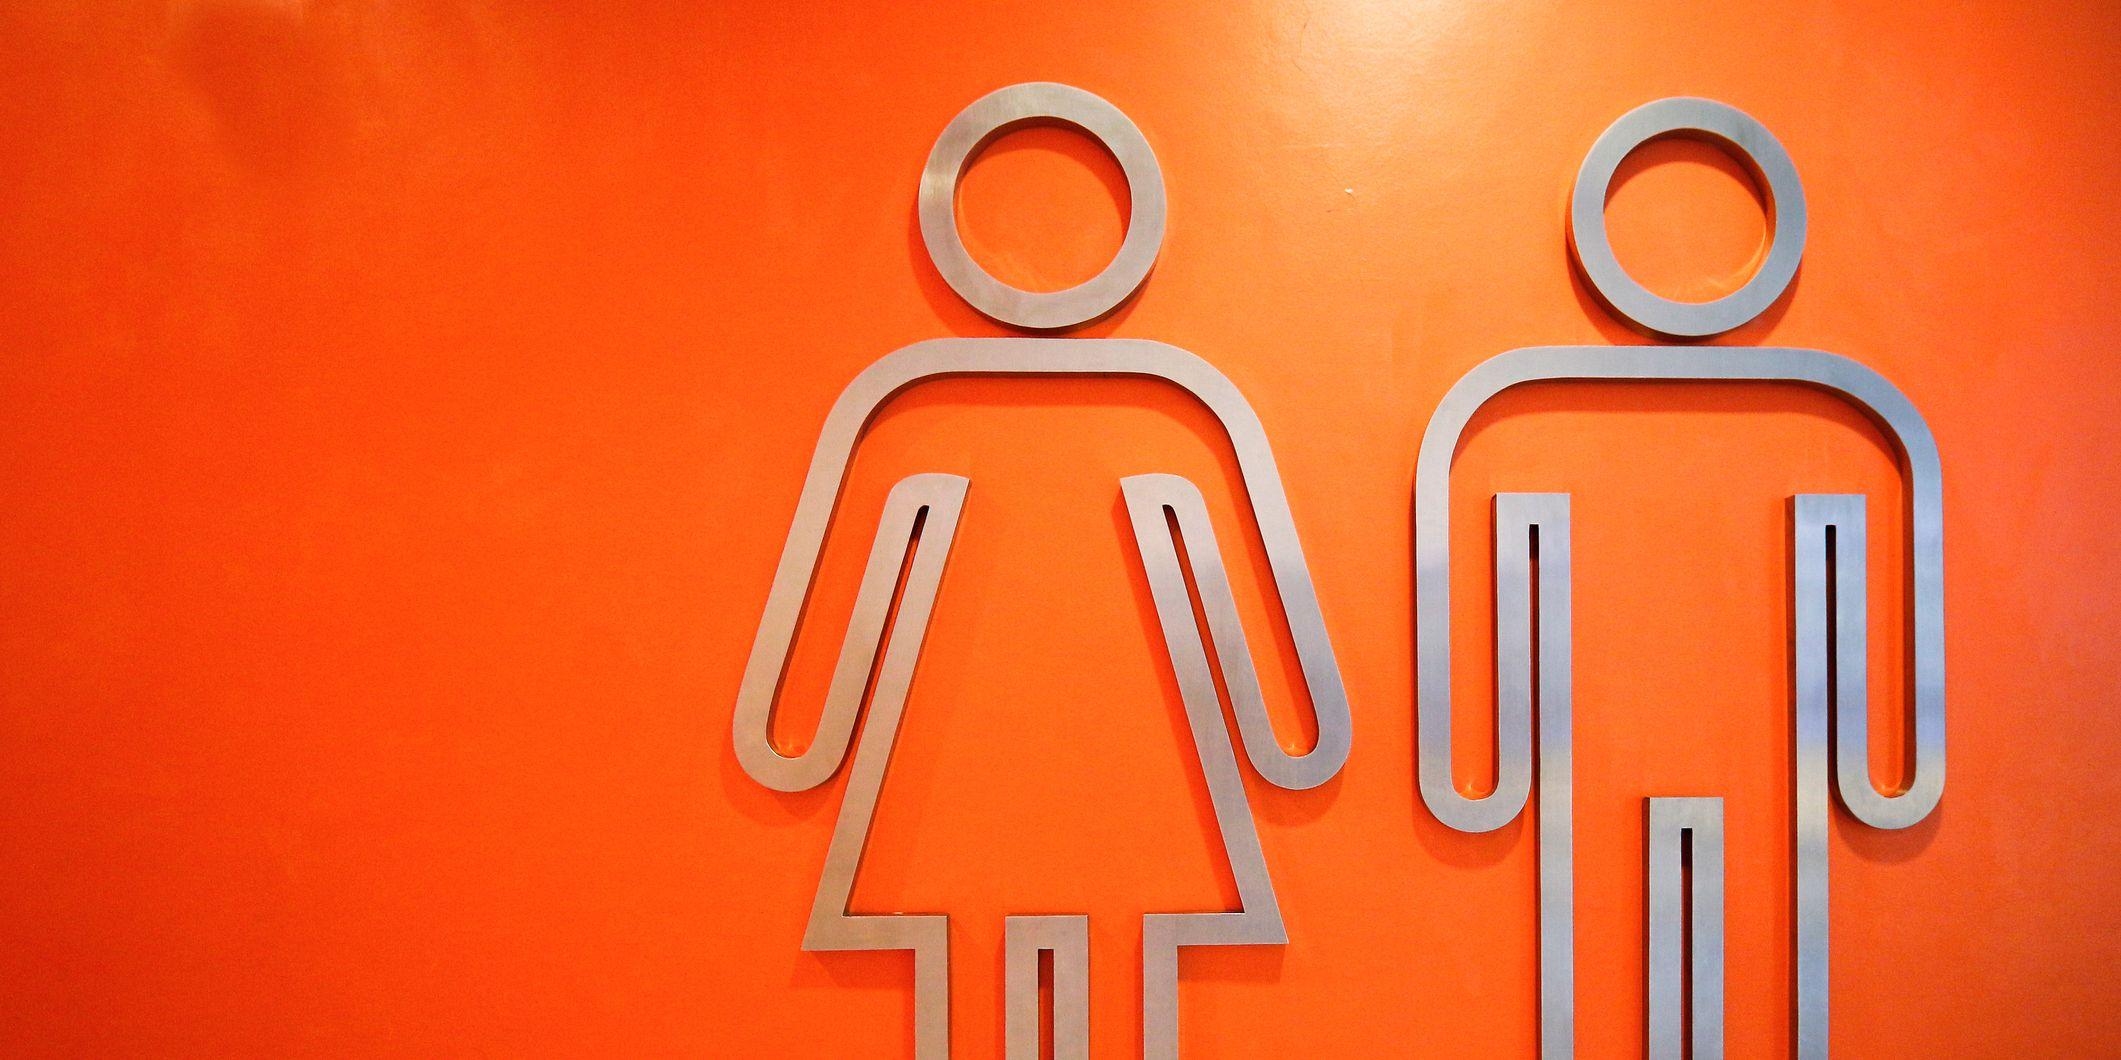 Close-Up Of Metallic Restroom Sign On Orange Wall